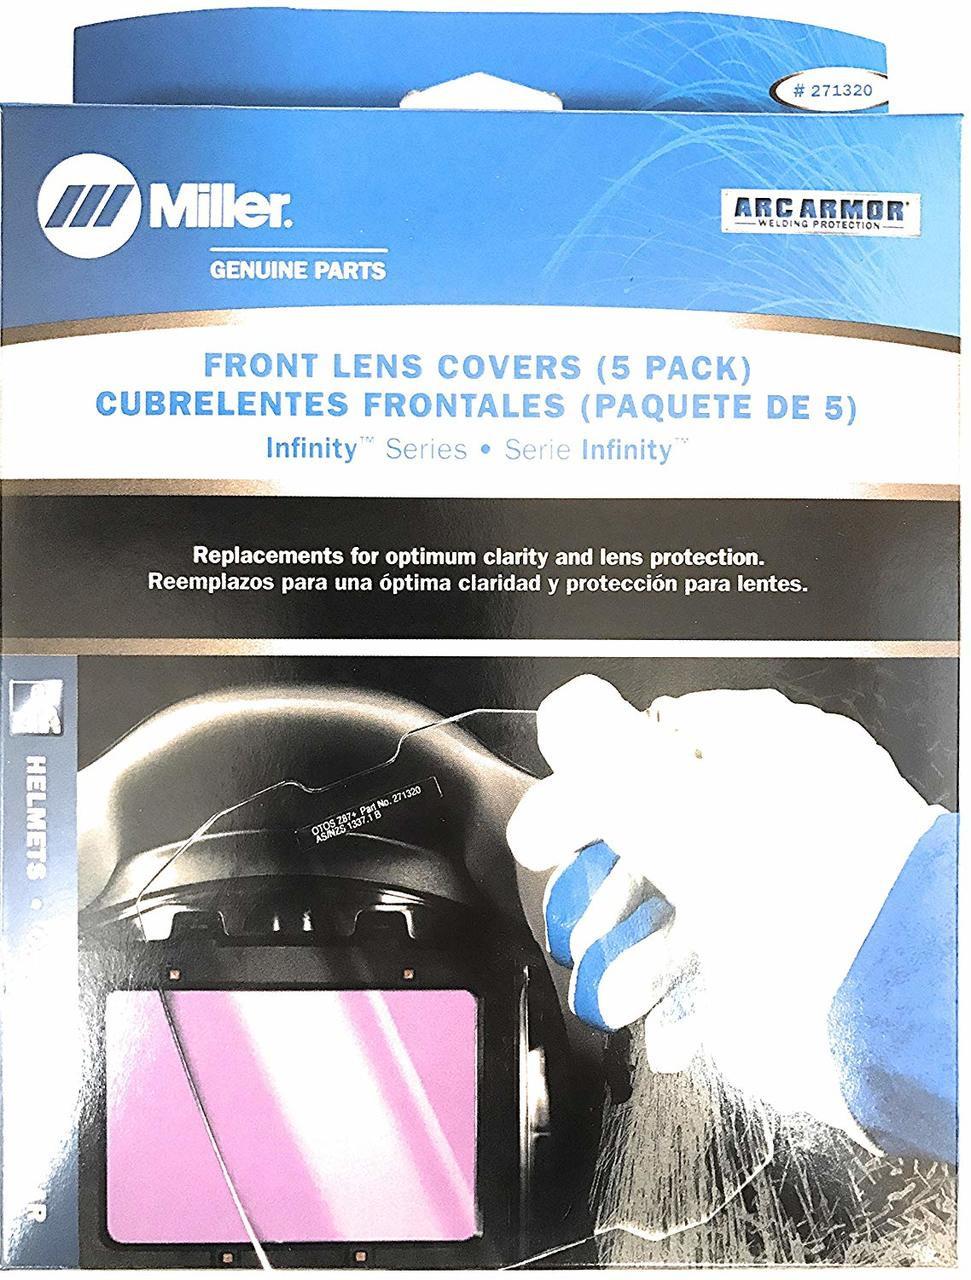 Miller 216326 Welding Helmet Front Lens Cover